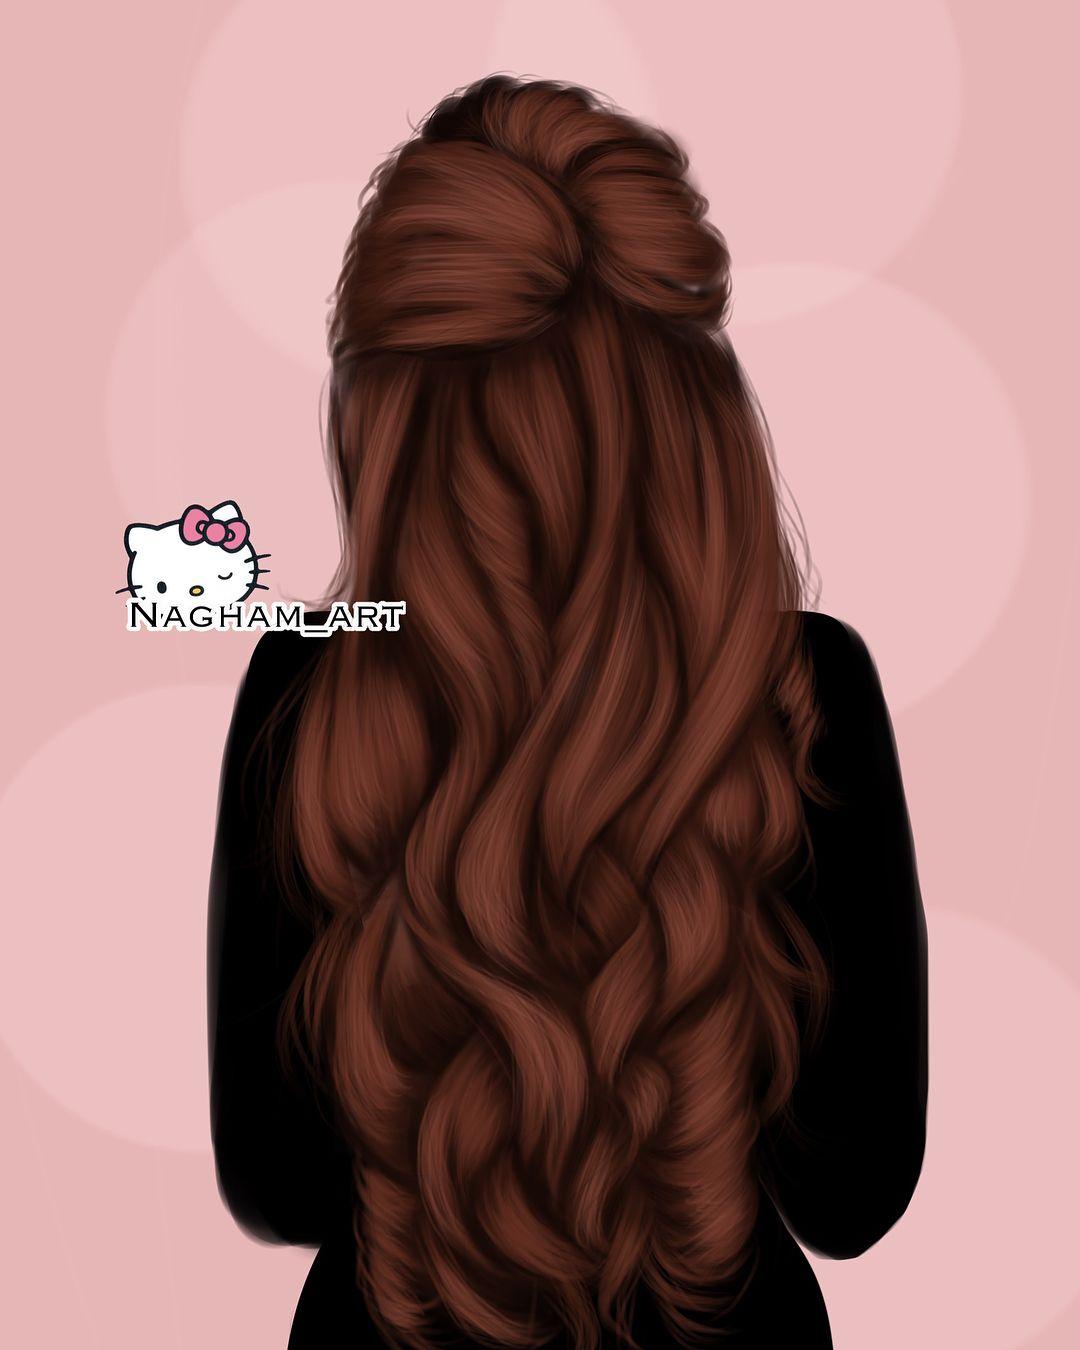 Pin By Angel On Chica Tumblr Dibujo Beautiful Girl Drawing Pop Art Girl Cute Girl Drawing